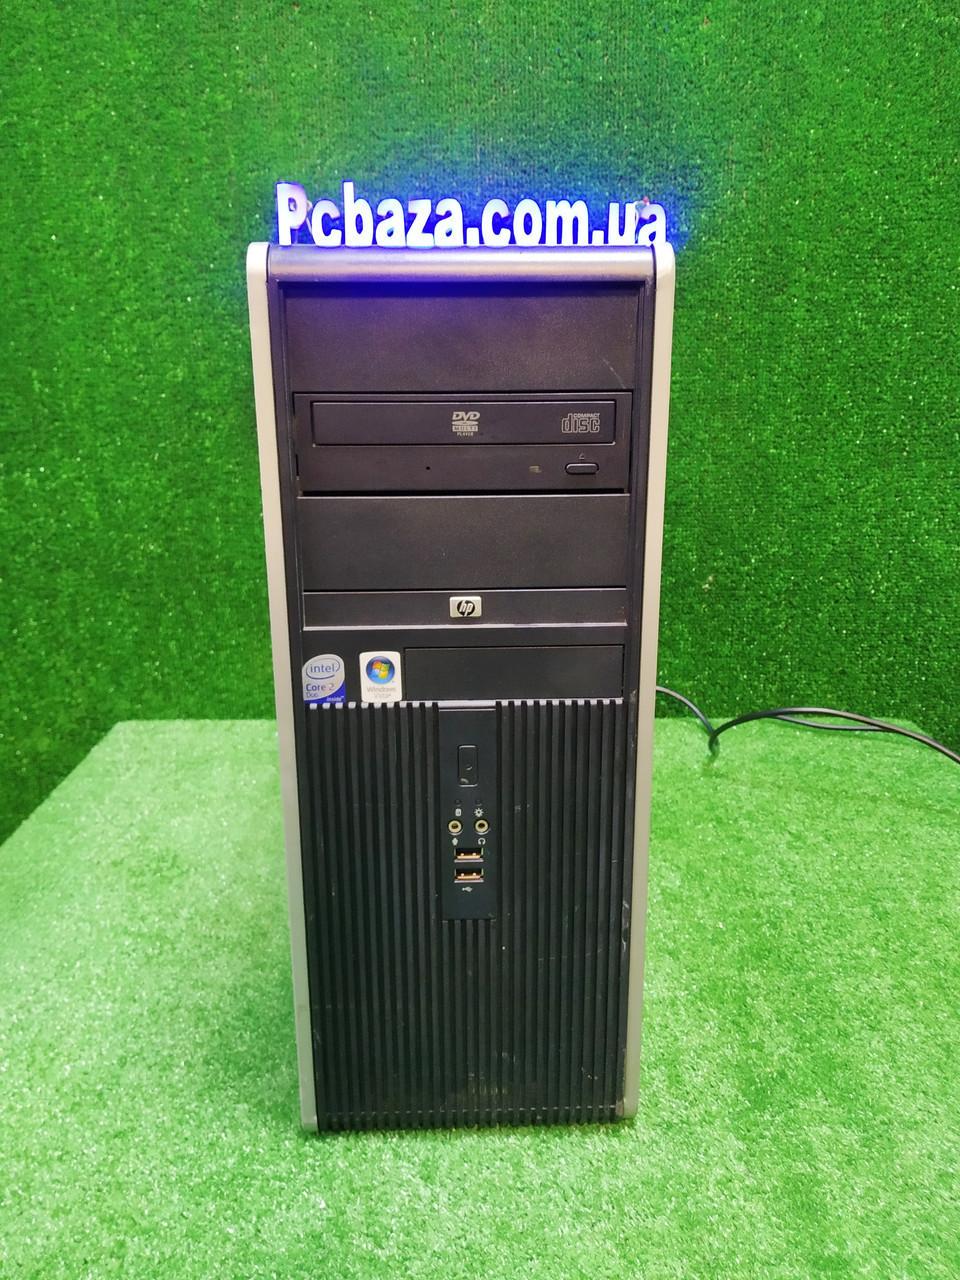 Компьютер HP dc 7800, Intel 2 мощных ядра E8400 3.0 Ггц, 4 ГБ, 500 ГБ Настроен! Есть Опт! Гарантия!